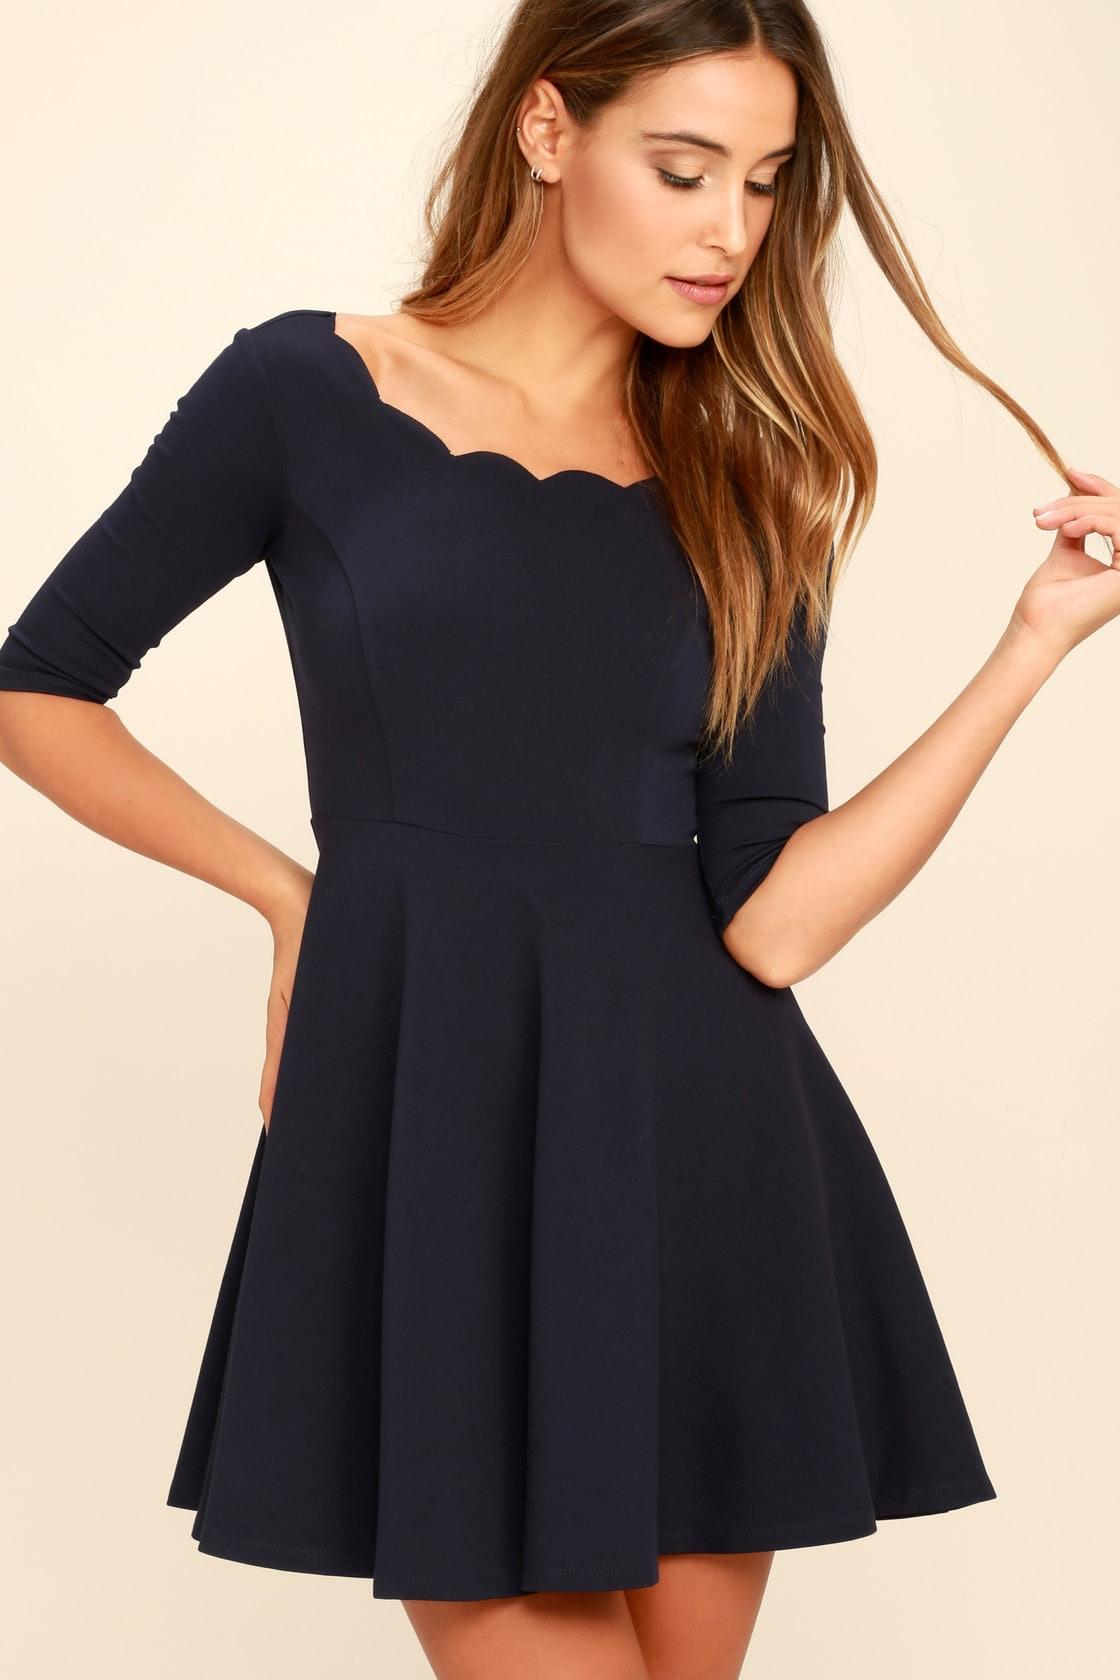 5c7240542305 15 Boat Neck Dresses Under $50 That Will Make You Feel Like Duchess Meghan  Markle